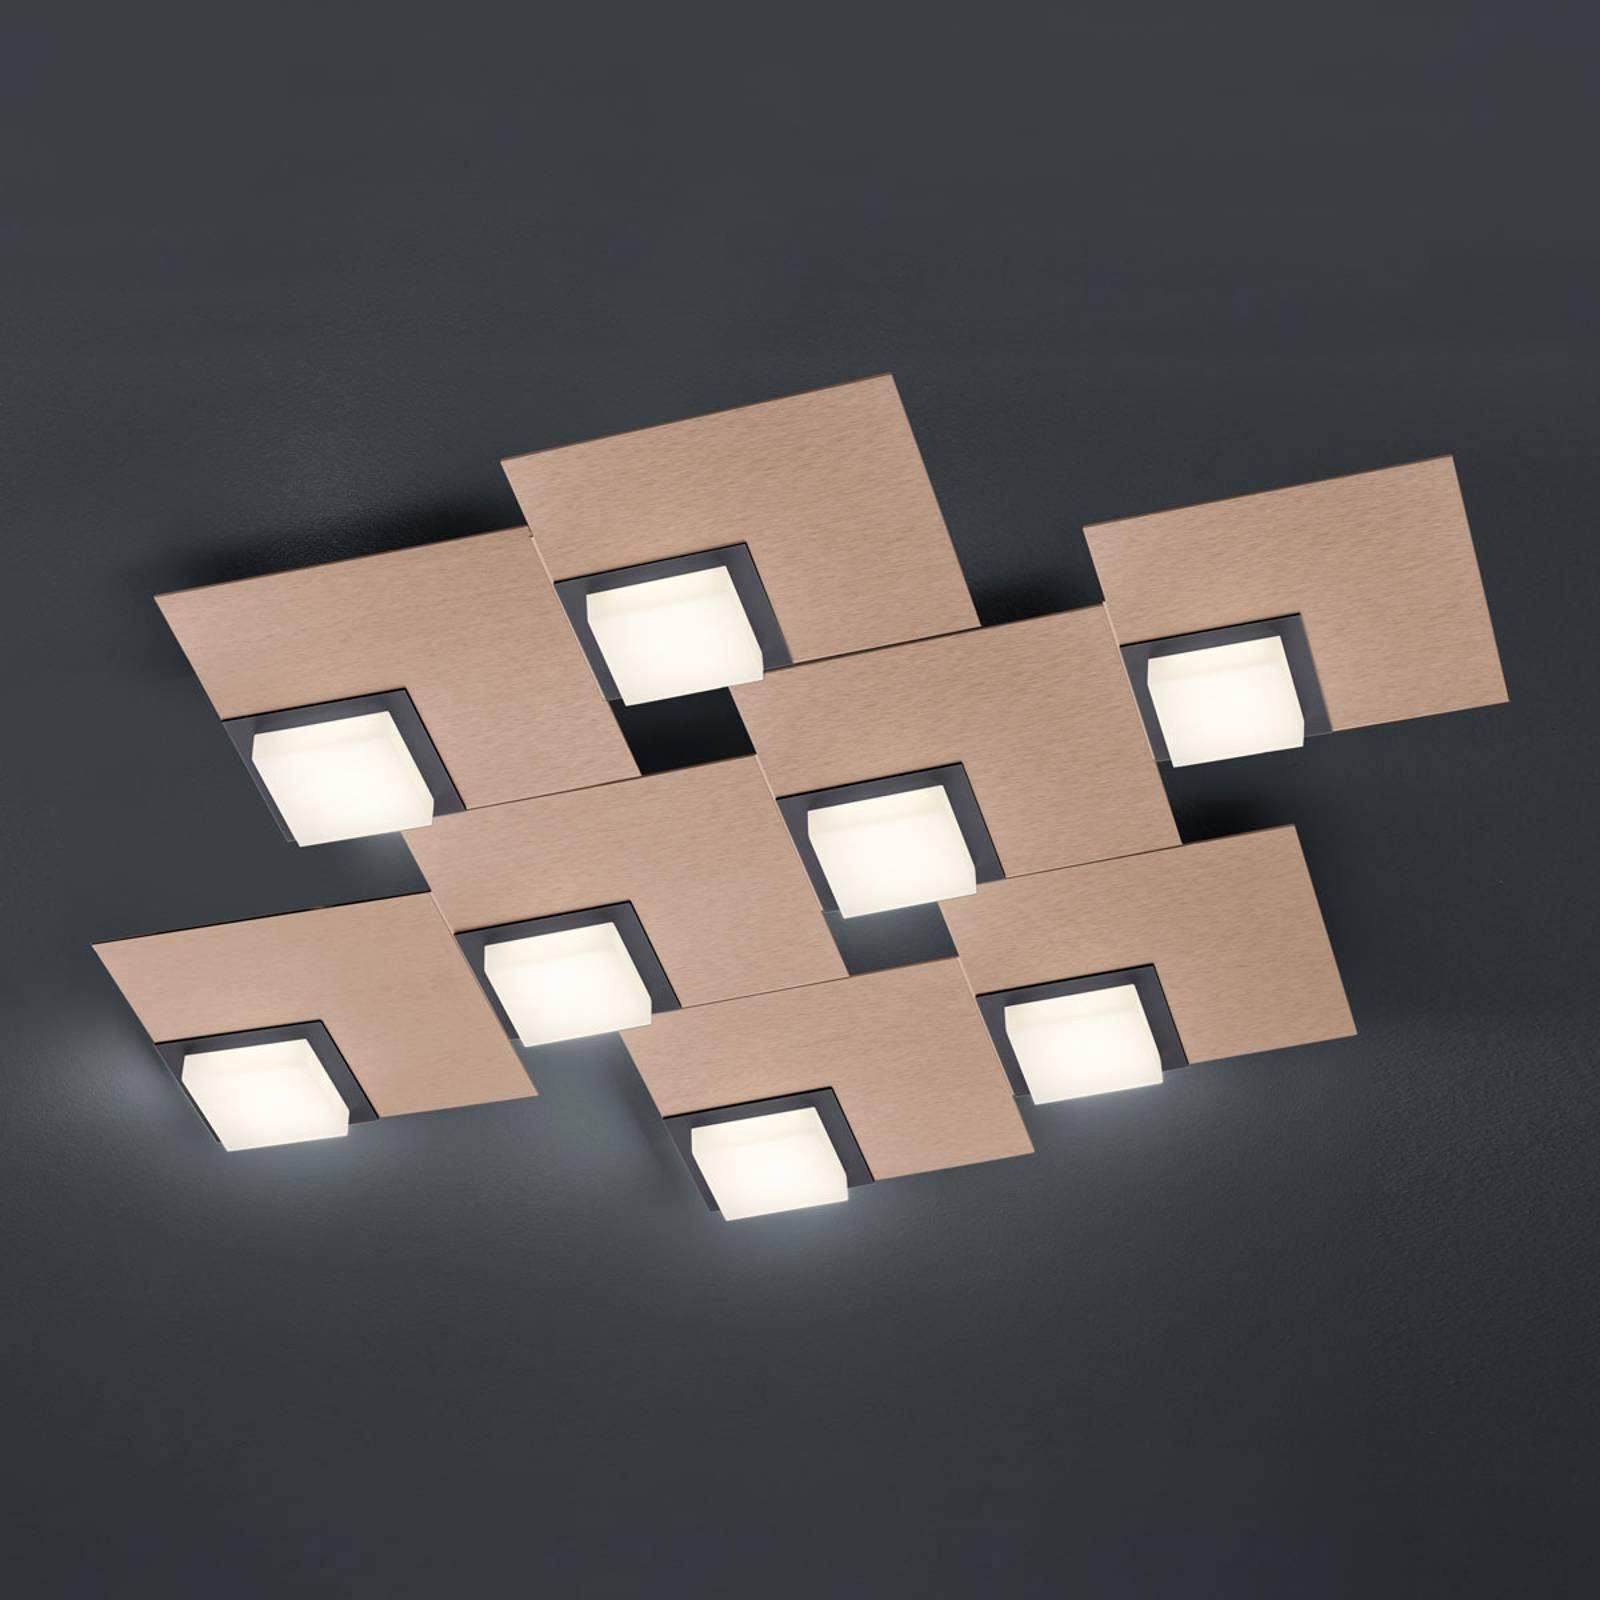 BANKAMP Quadro LED-plafondlamp 64 W , rosé goud